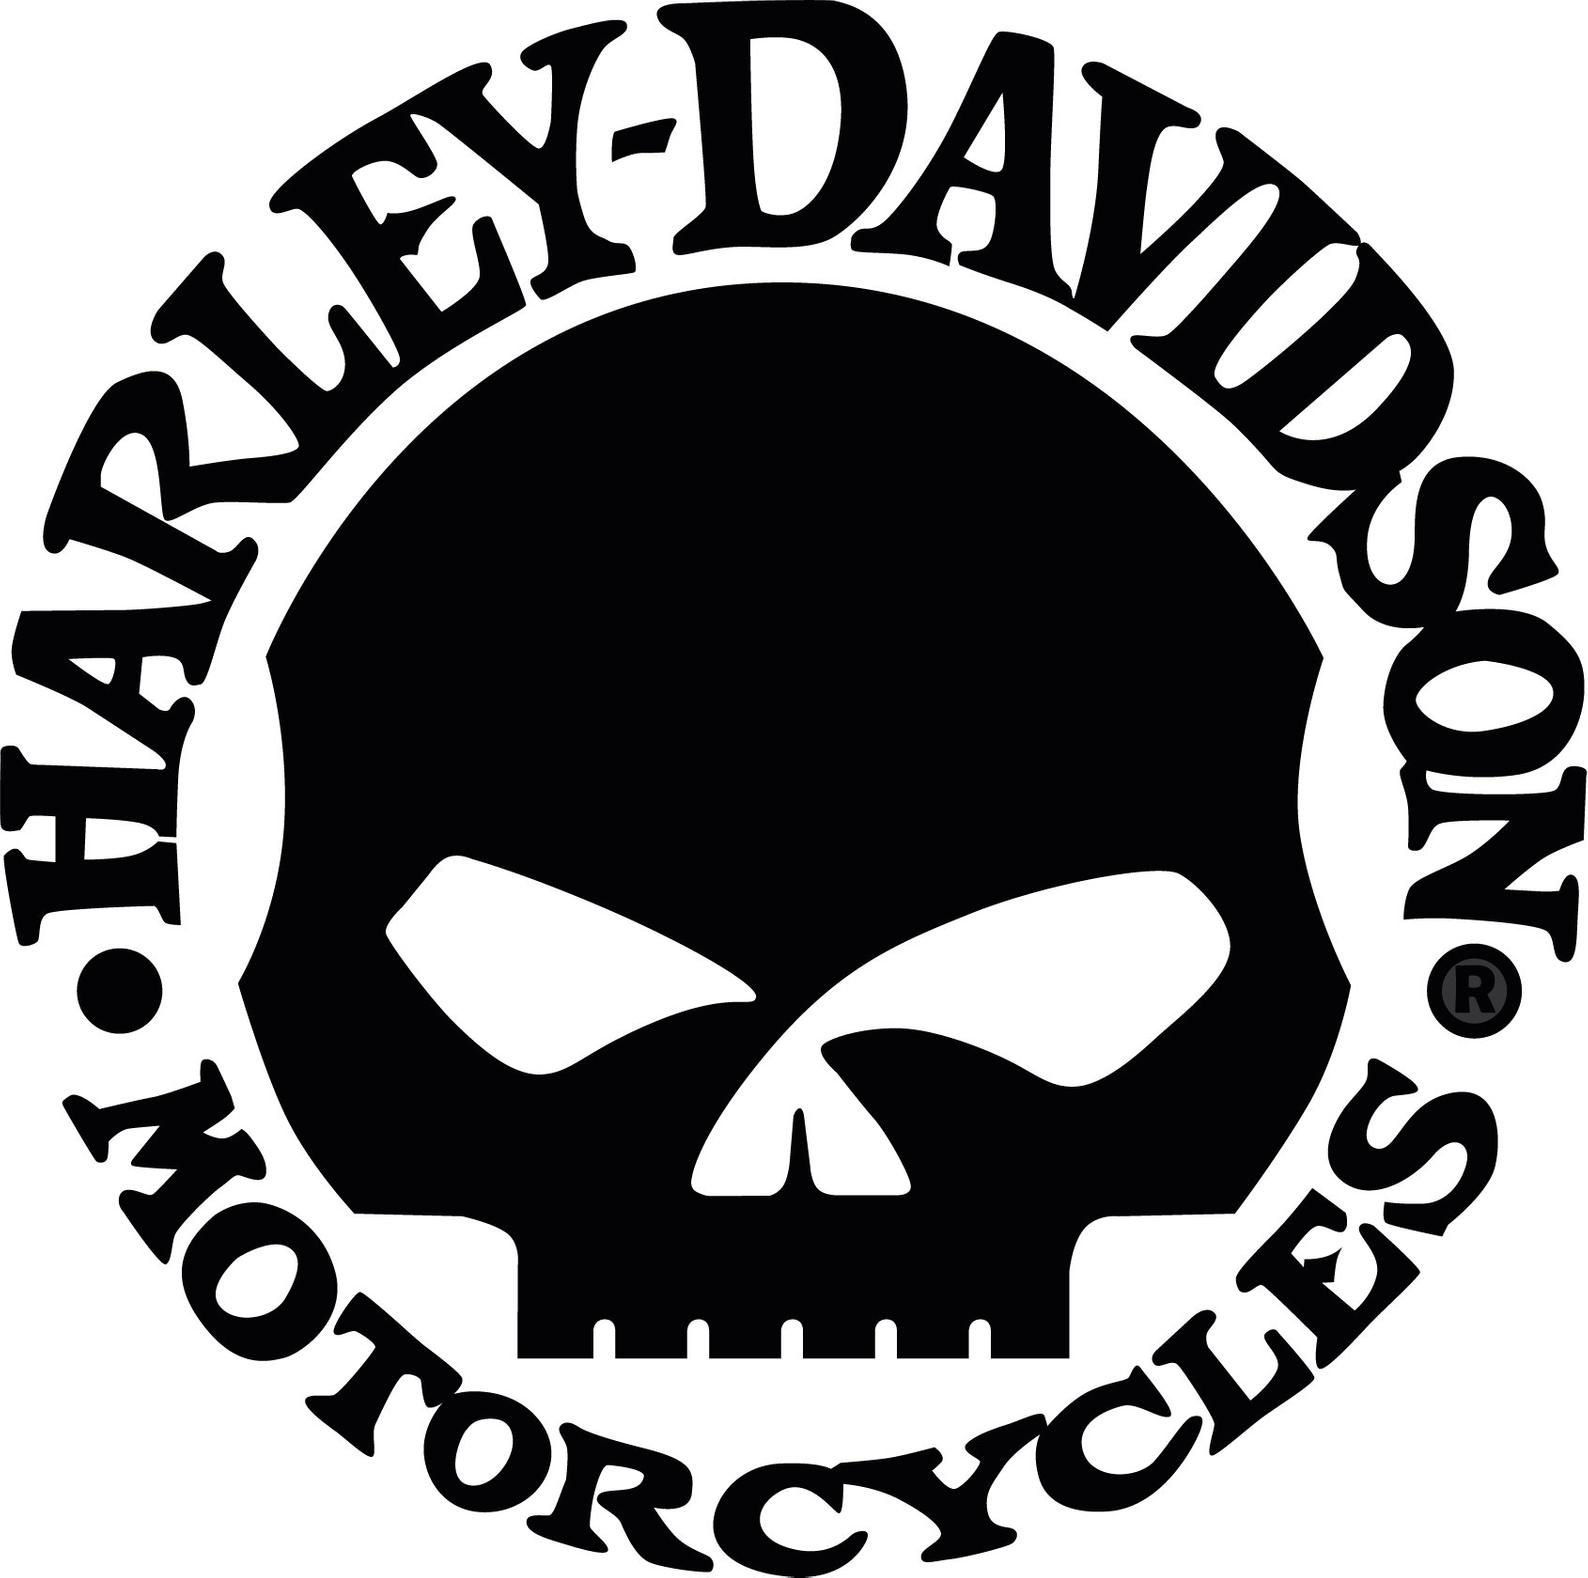 Harley Davidson Svg Bundle 17 Designs 102 Items Stickers Svg Pdf Jpg Eps Fxg Ai Motorcycle Hd Graphics Wings Eagles Logos Bundle In 2021 Harley Davidson Decals Harley Davidson Logo Harley Davidson Pictures